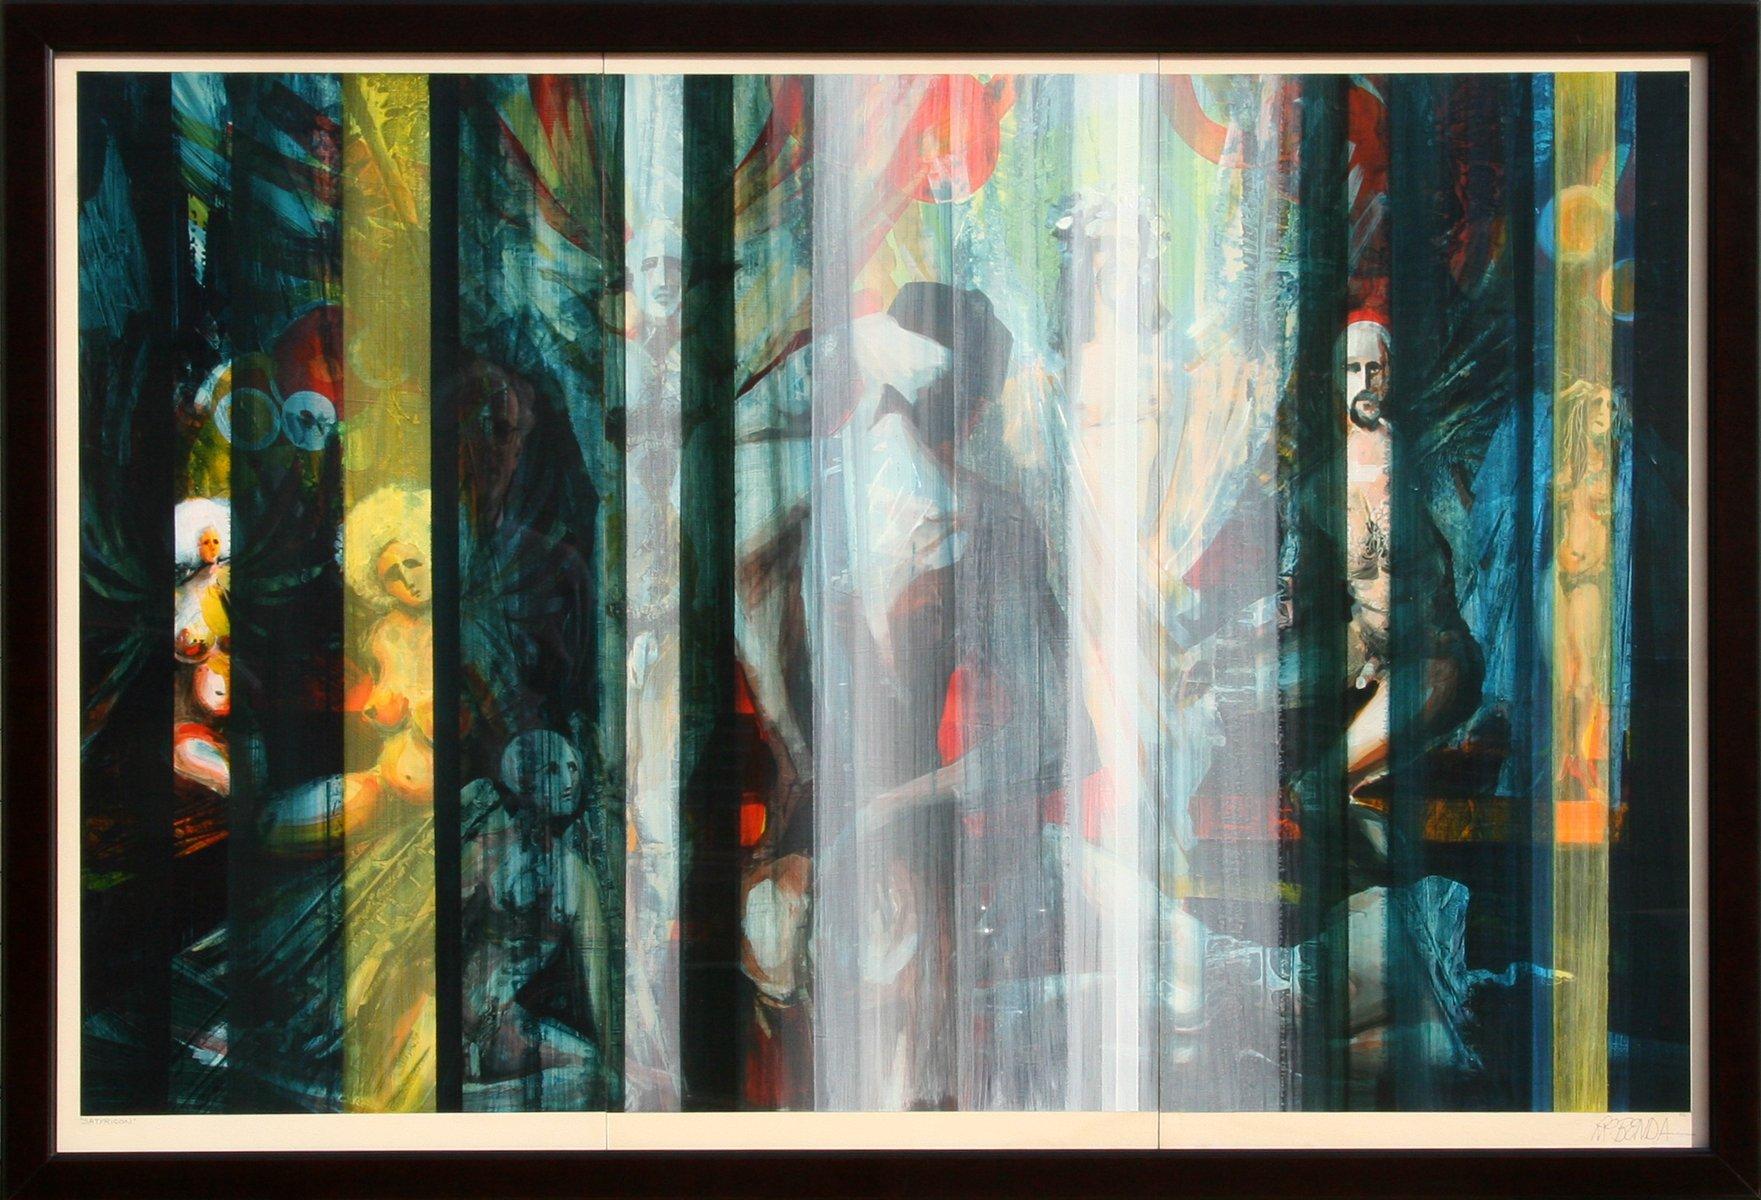 Satyricon - Triptych by